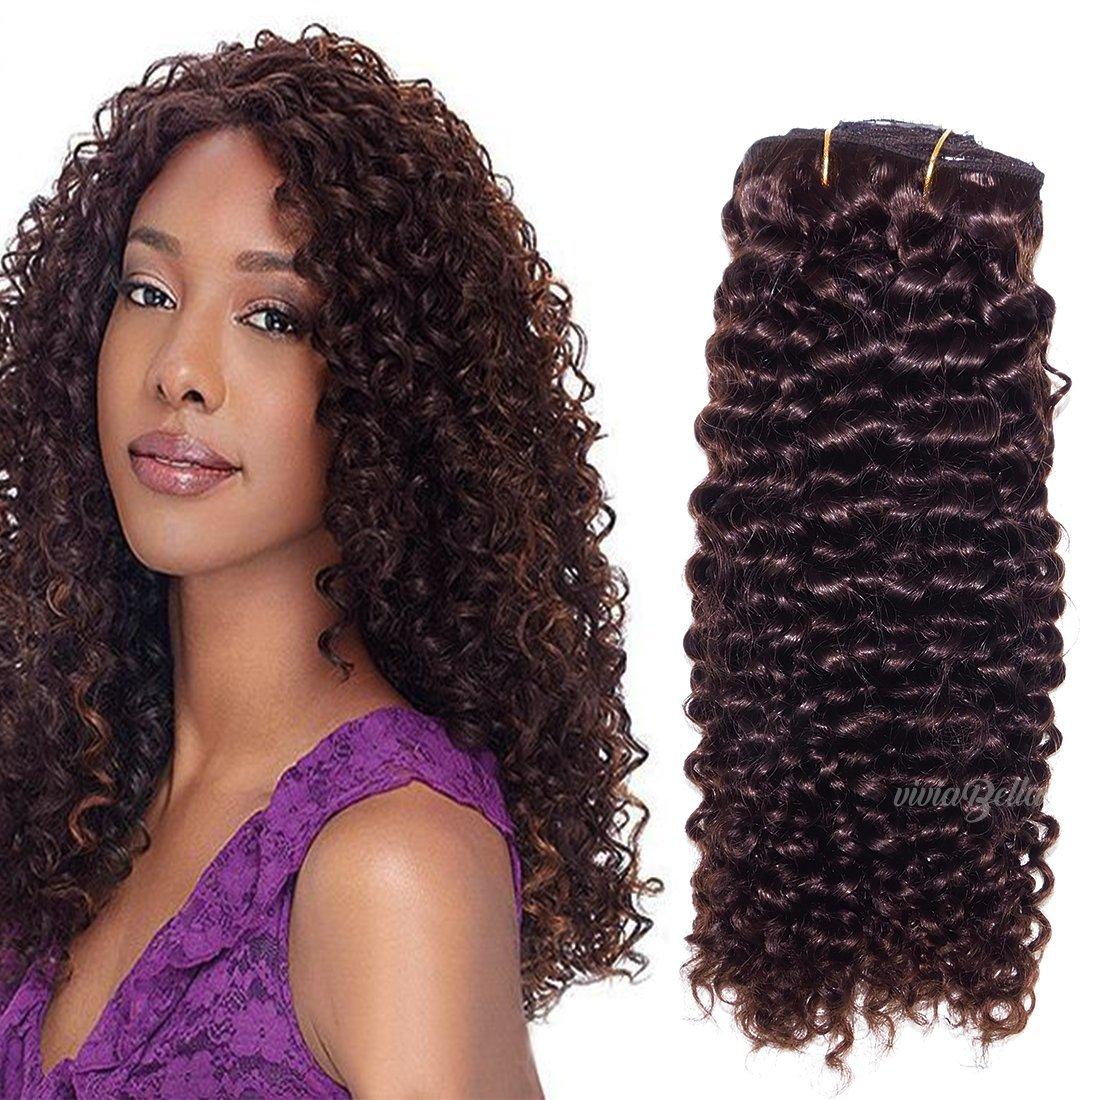 "Dark Brown Jerry Curly Clip In Hair Extensions Unprocessed Human Hair Brazilian Virgin Hair For Black Women 7pcs/lot Clip Ins (120g/set 14"", Dark Brown)"